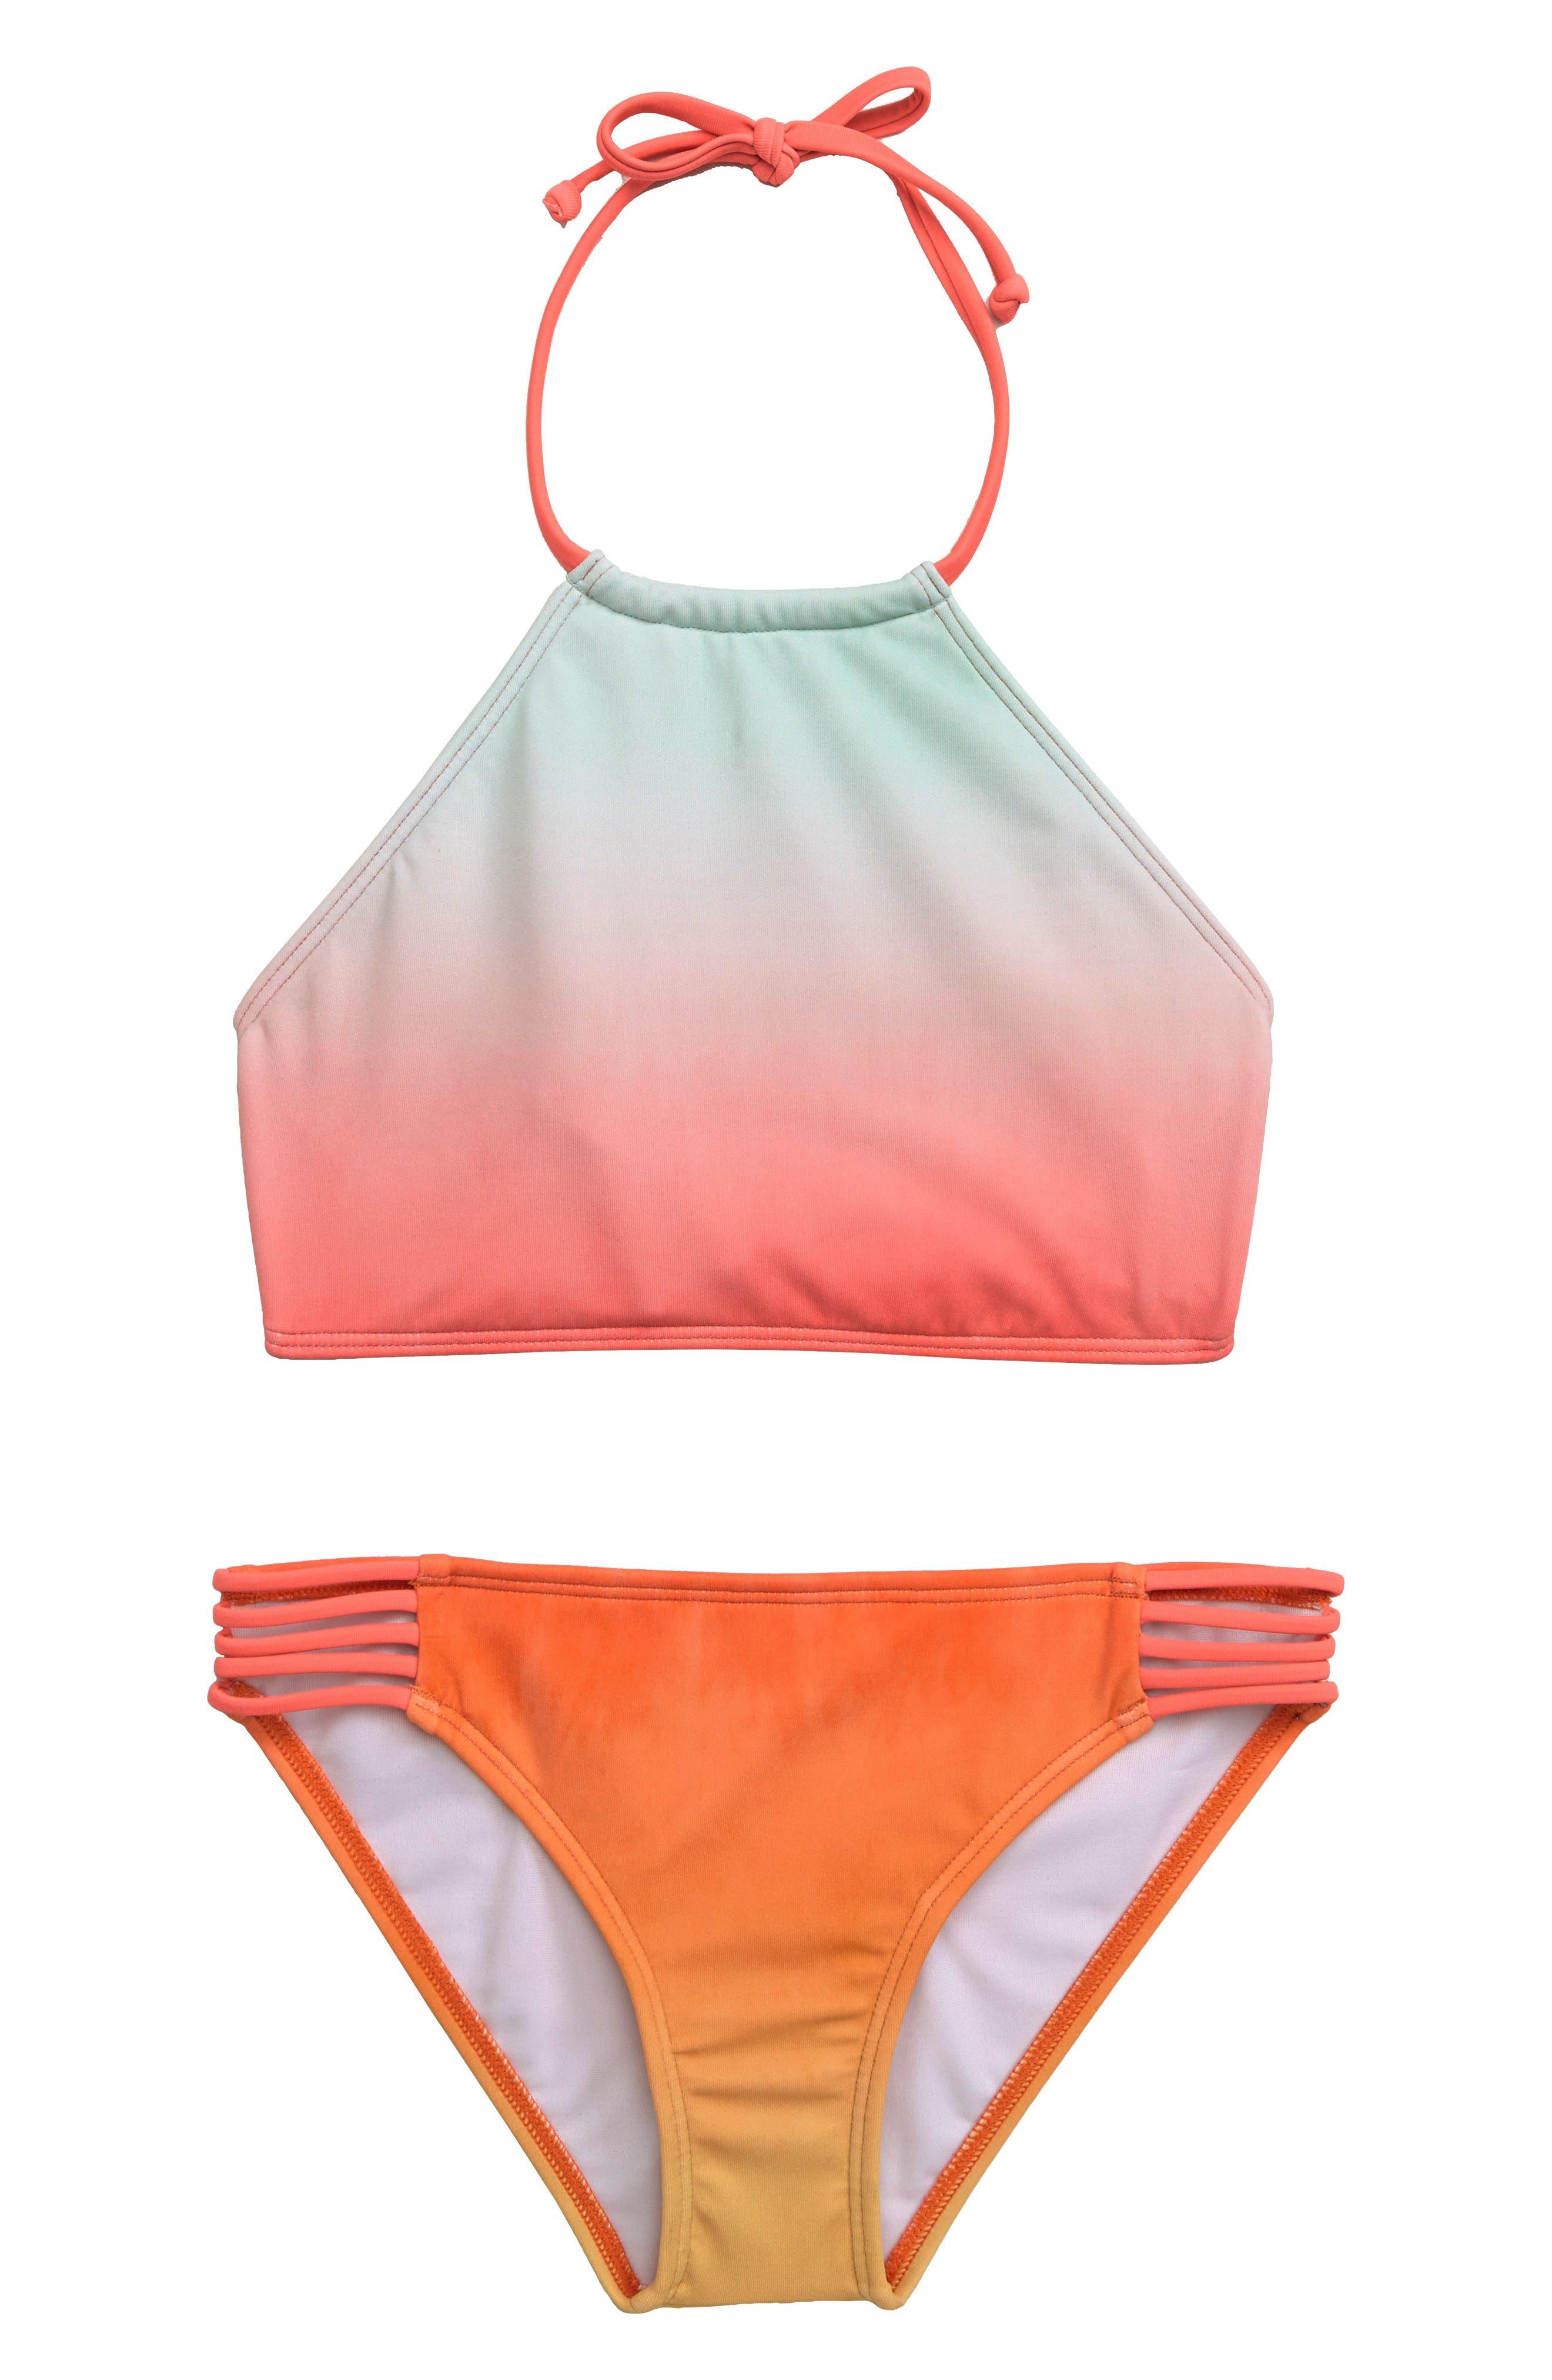 Girls Billabong Hazy Daze TwoPiece Swimsuit Size 6X  Coral